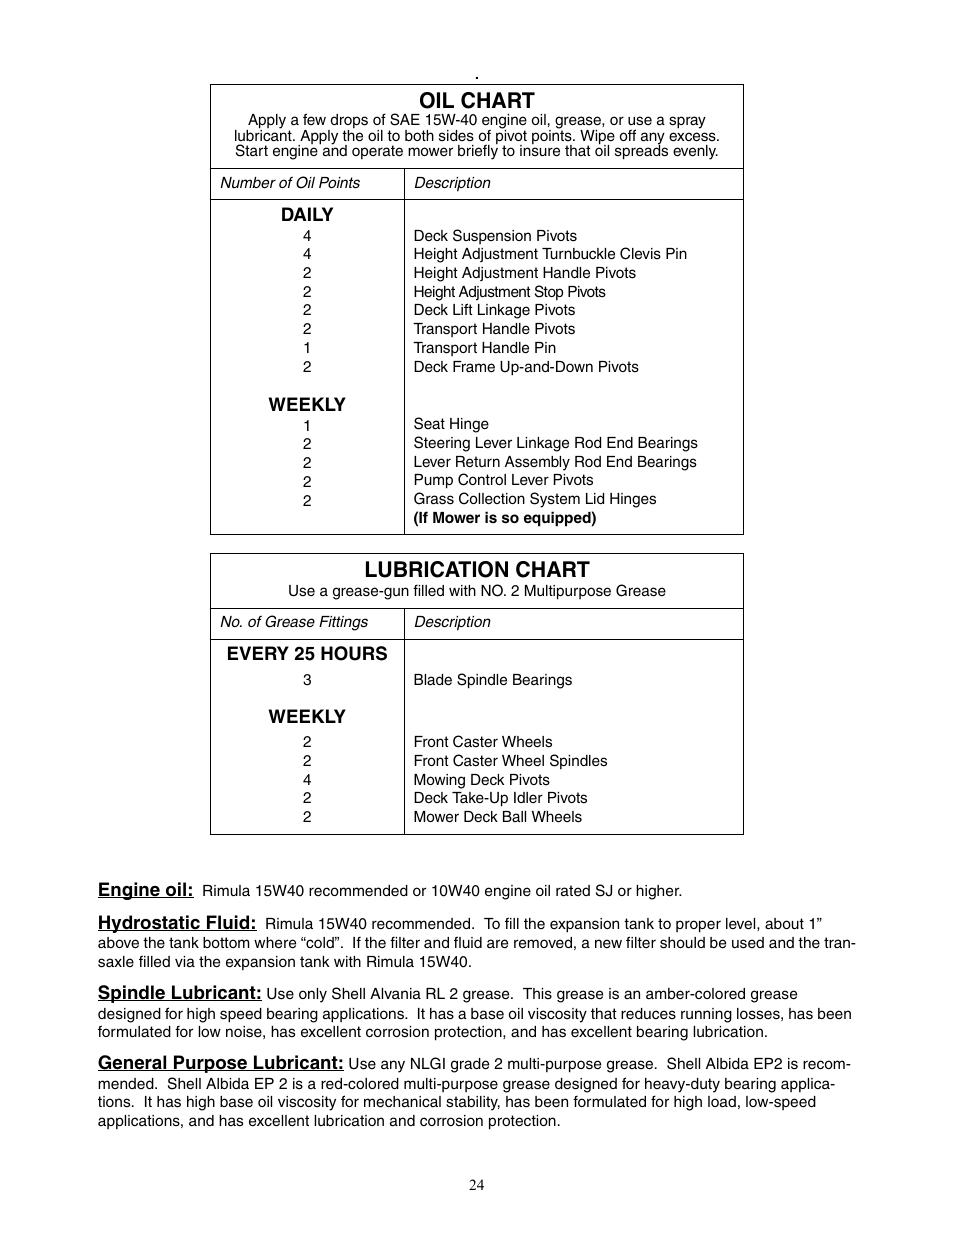 Oil chart, Lubrication chart | Cub Cadet 22HP ENFORCER 48 EN